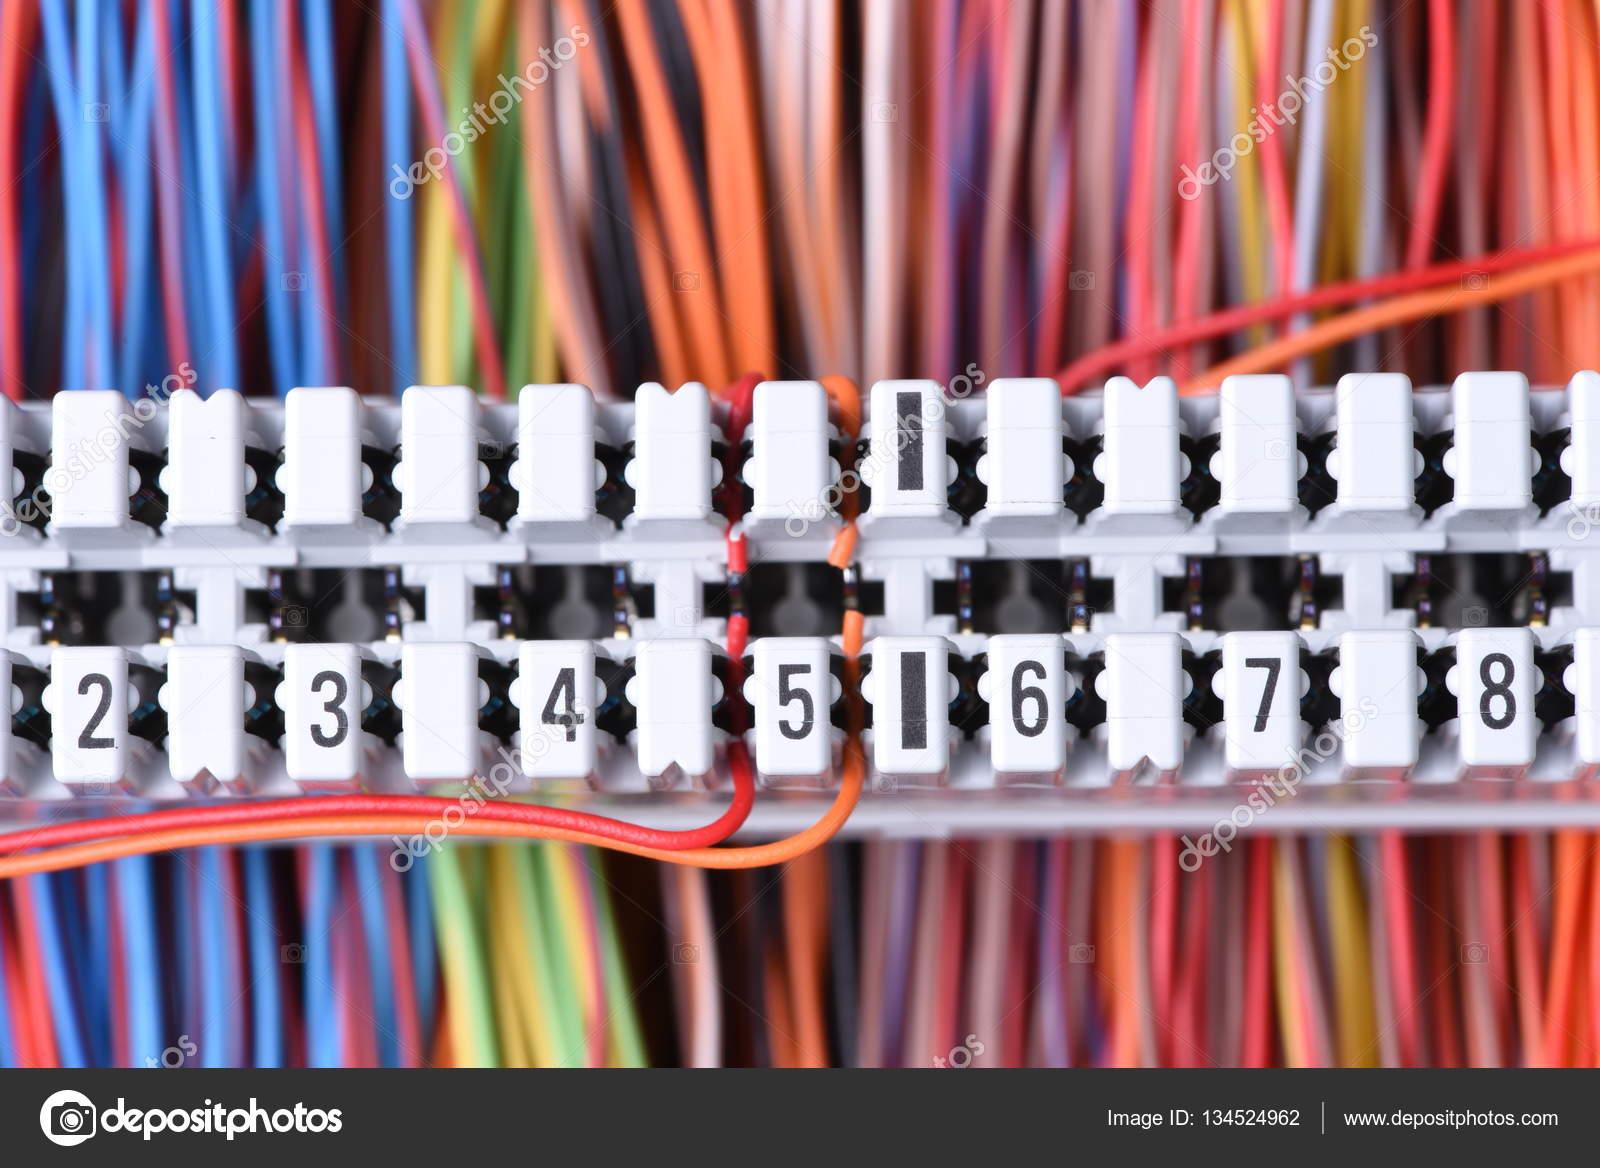 Telekommunikationsgeräte, Hauptverteiler mit Kabel — Stockfoto ...